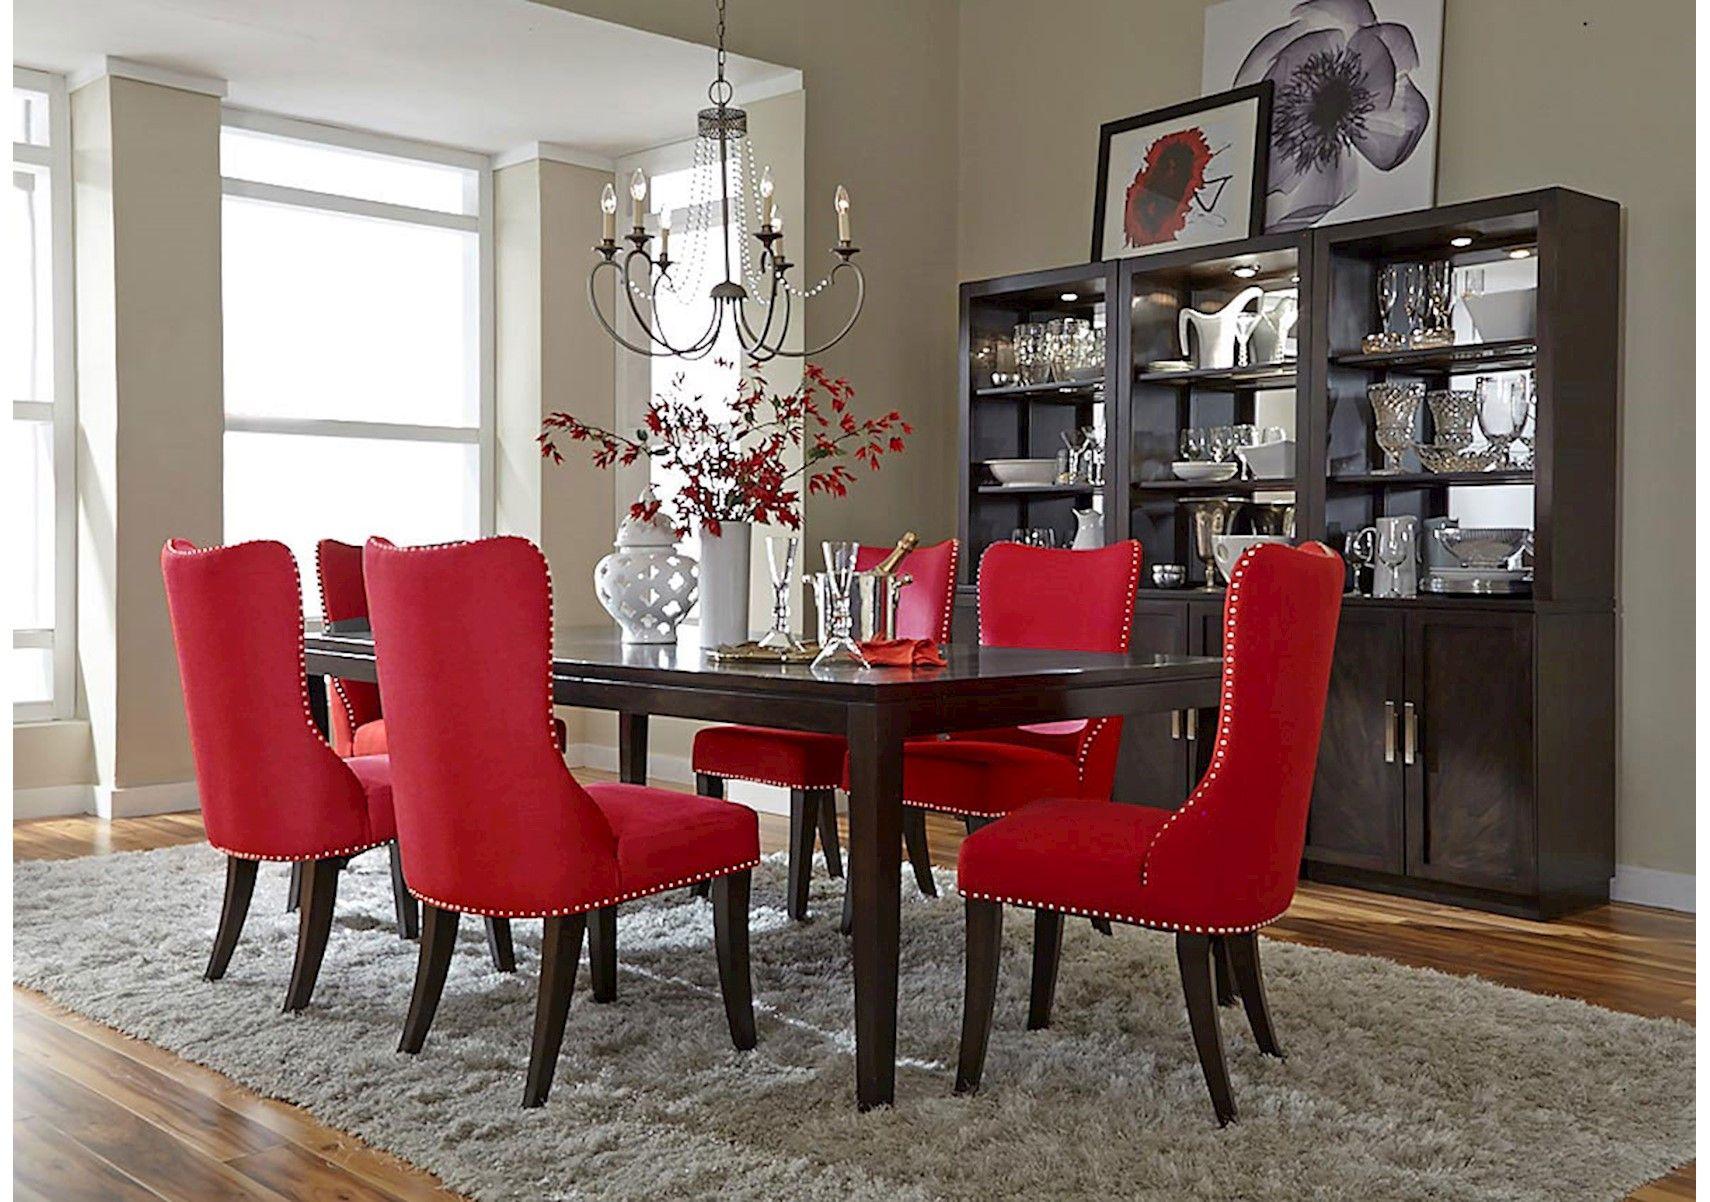 Lacks Platinum Red 7 Pc Dining Set Dining Room Sets Dining